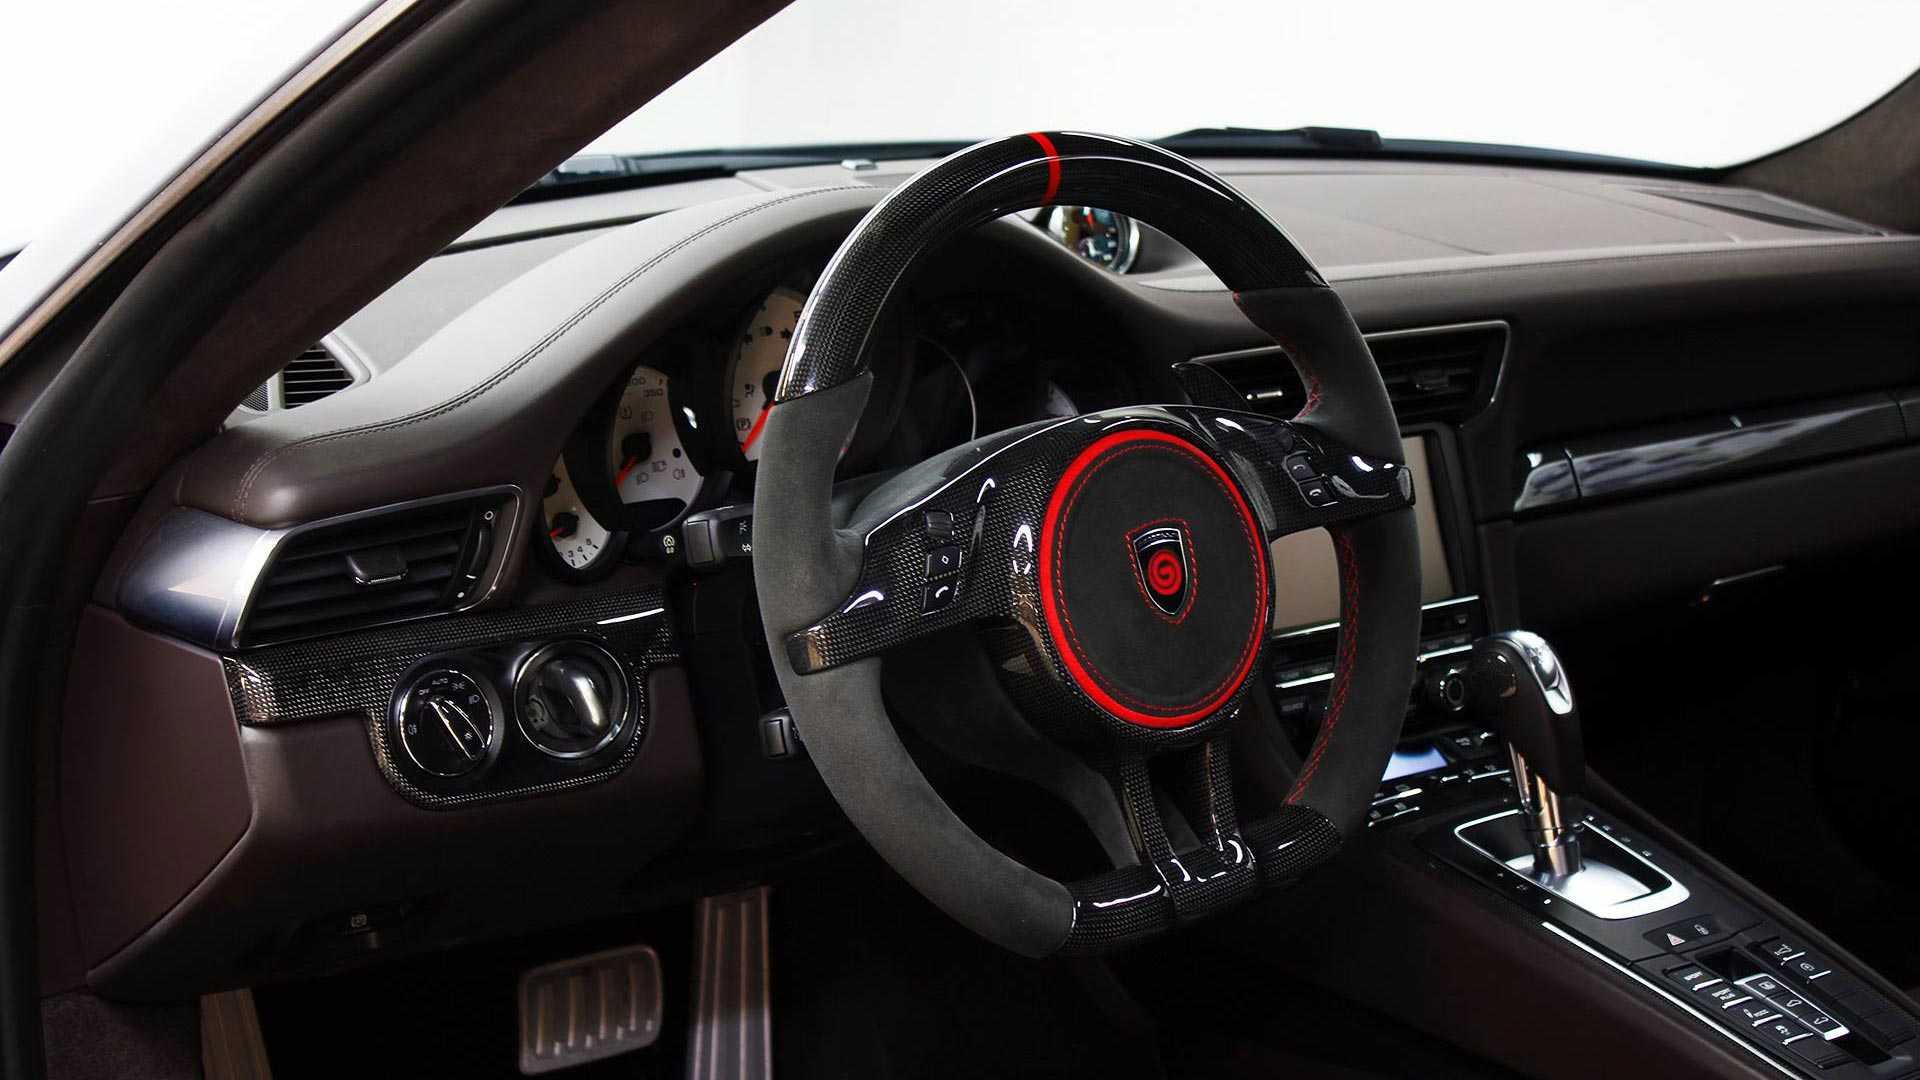 Porsche_911_Turbo_Gemballa-GTR_8XX_Evo-R_0004